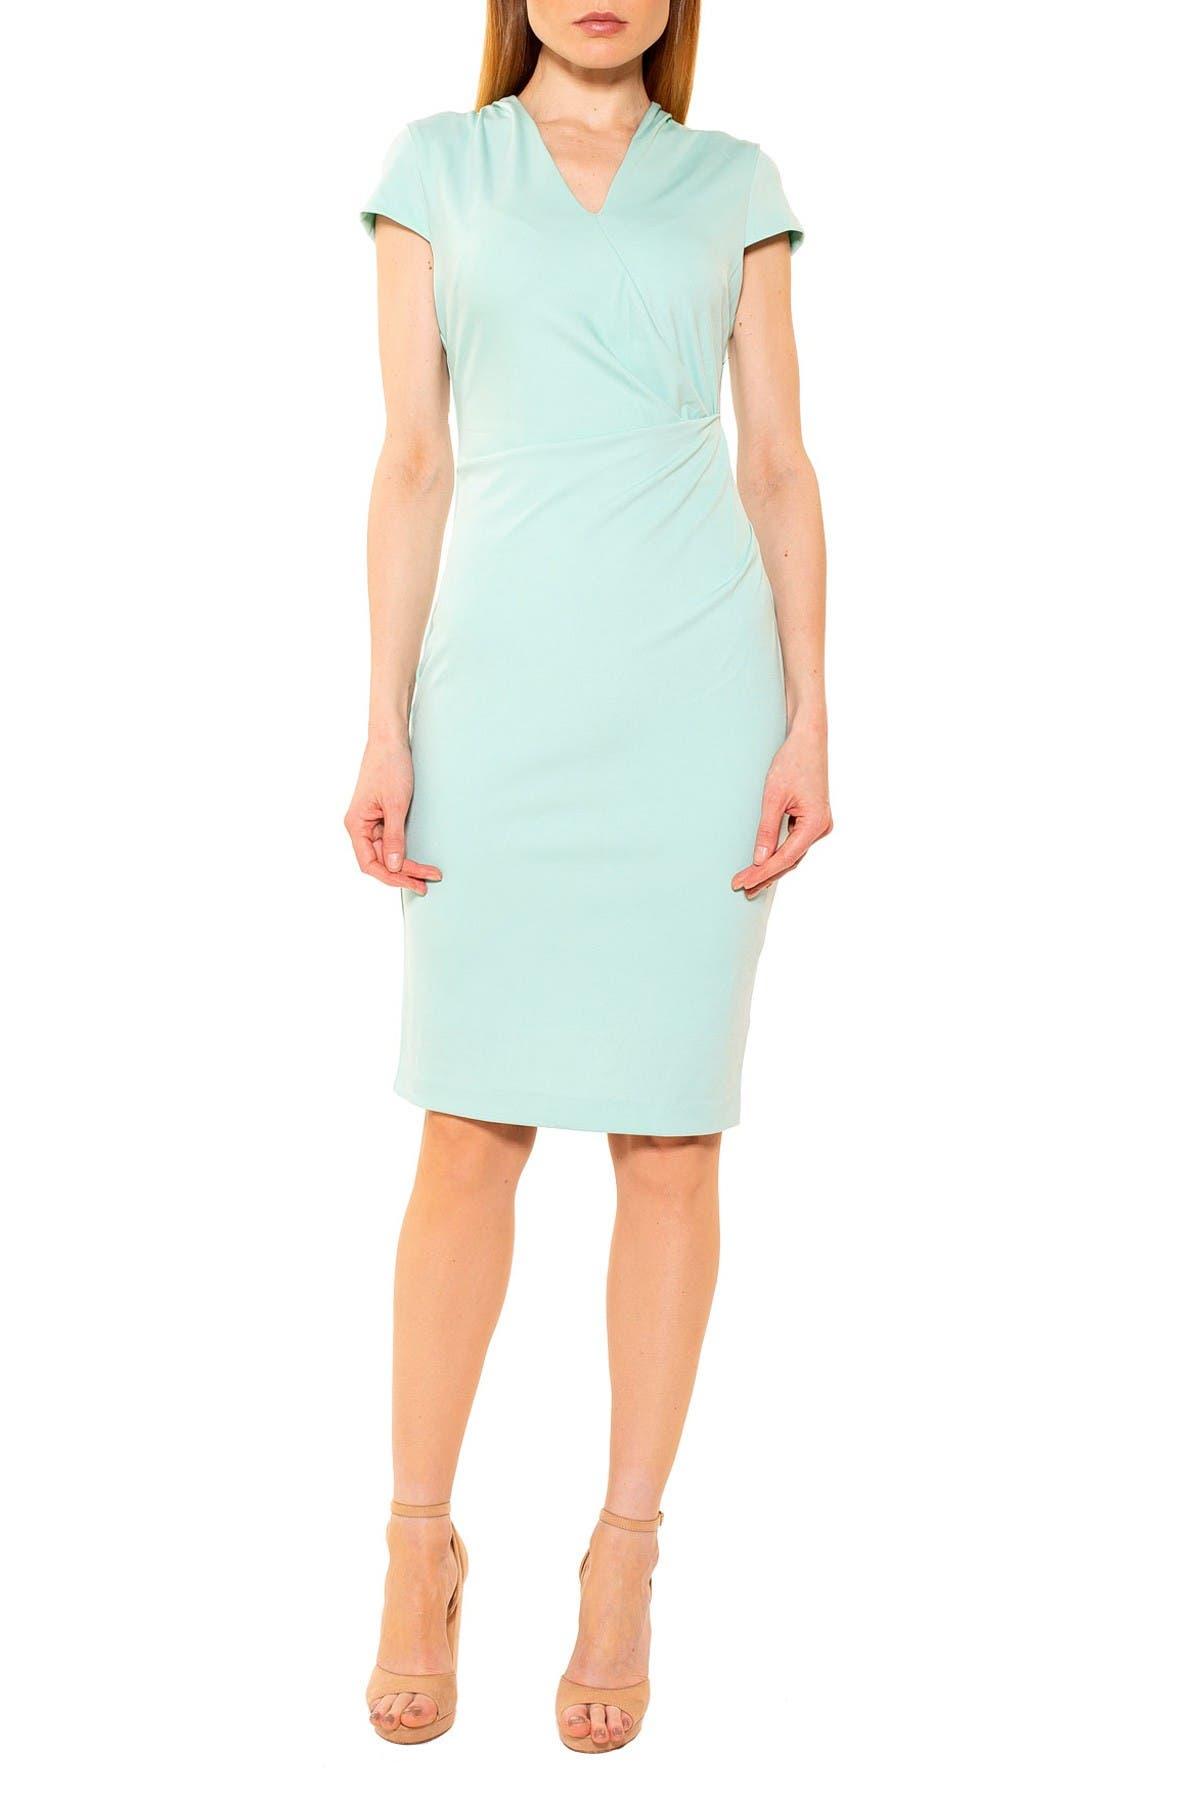 Image of Alexia Admor Kinsley Cap Sleeve Sheath Dress